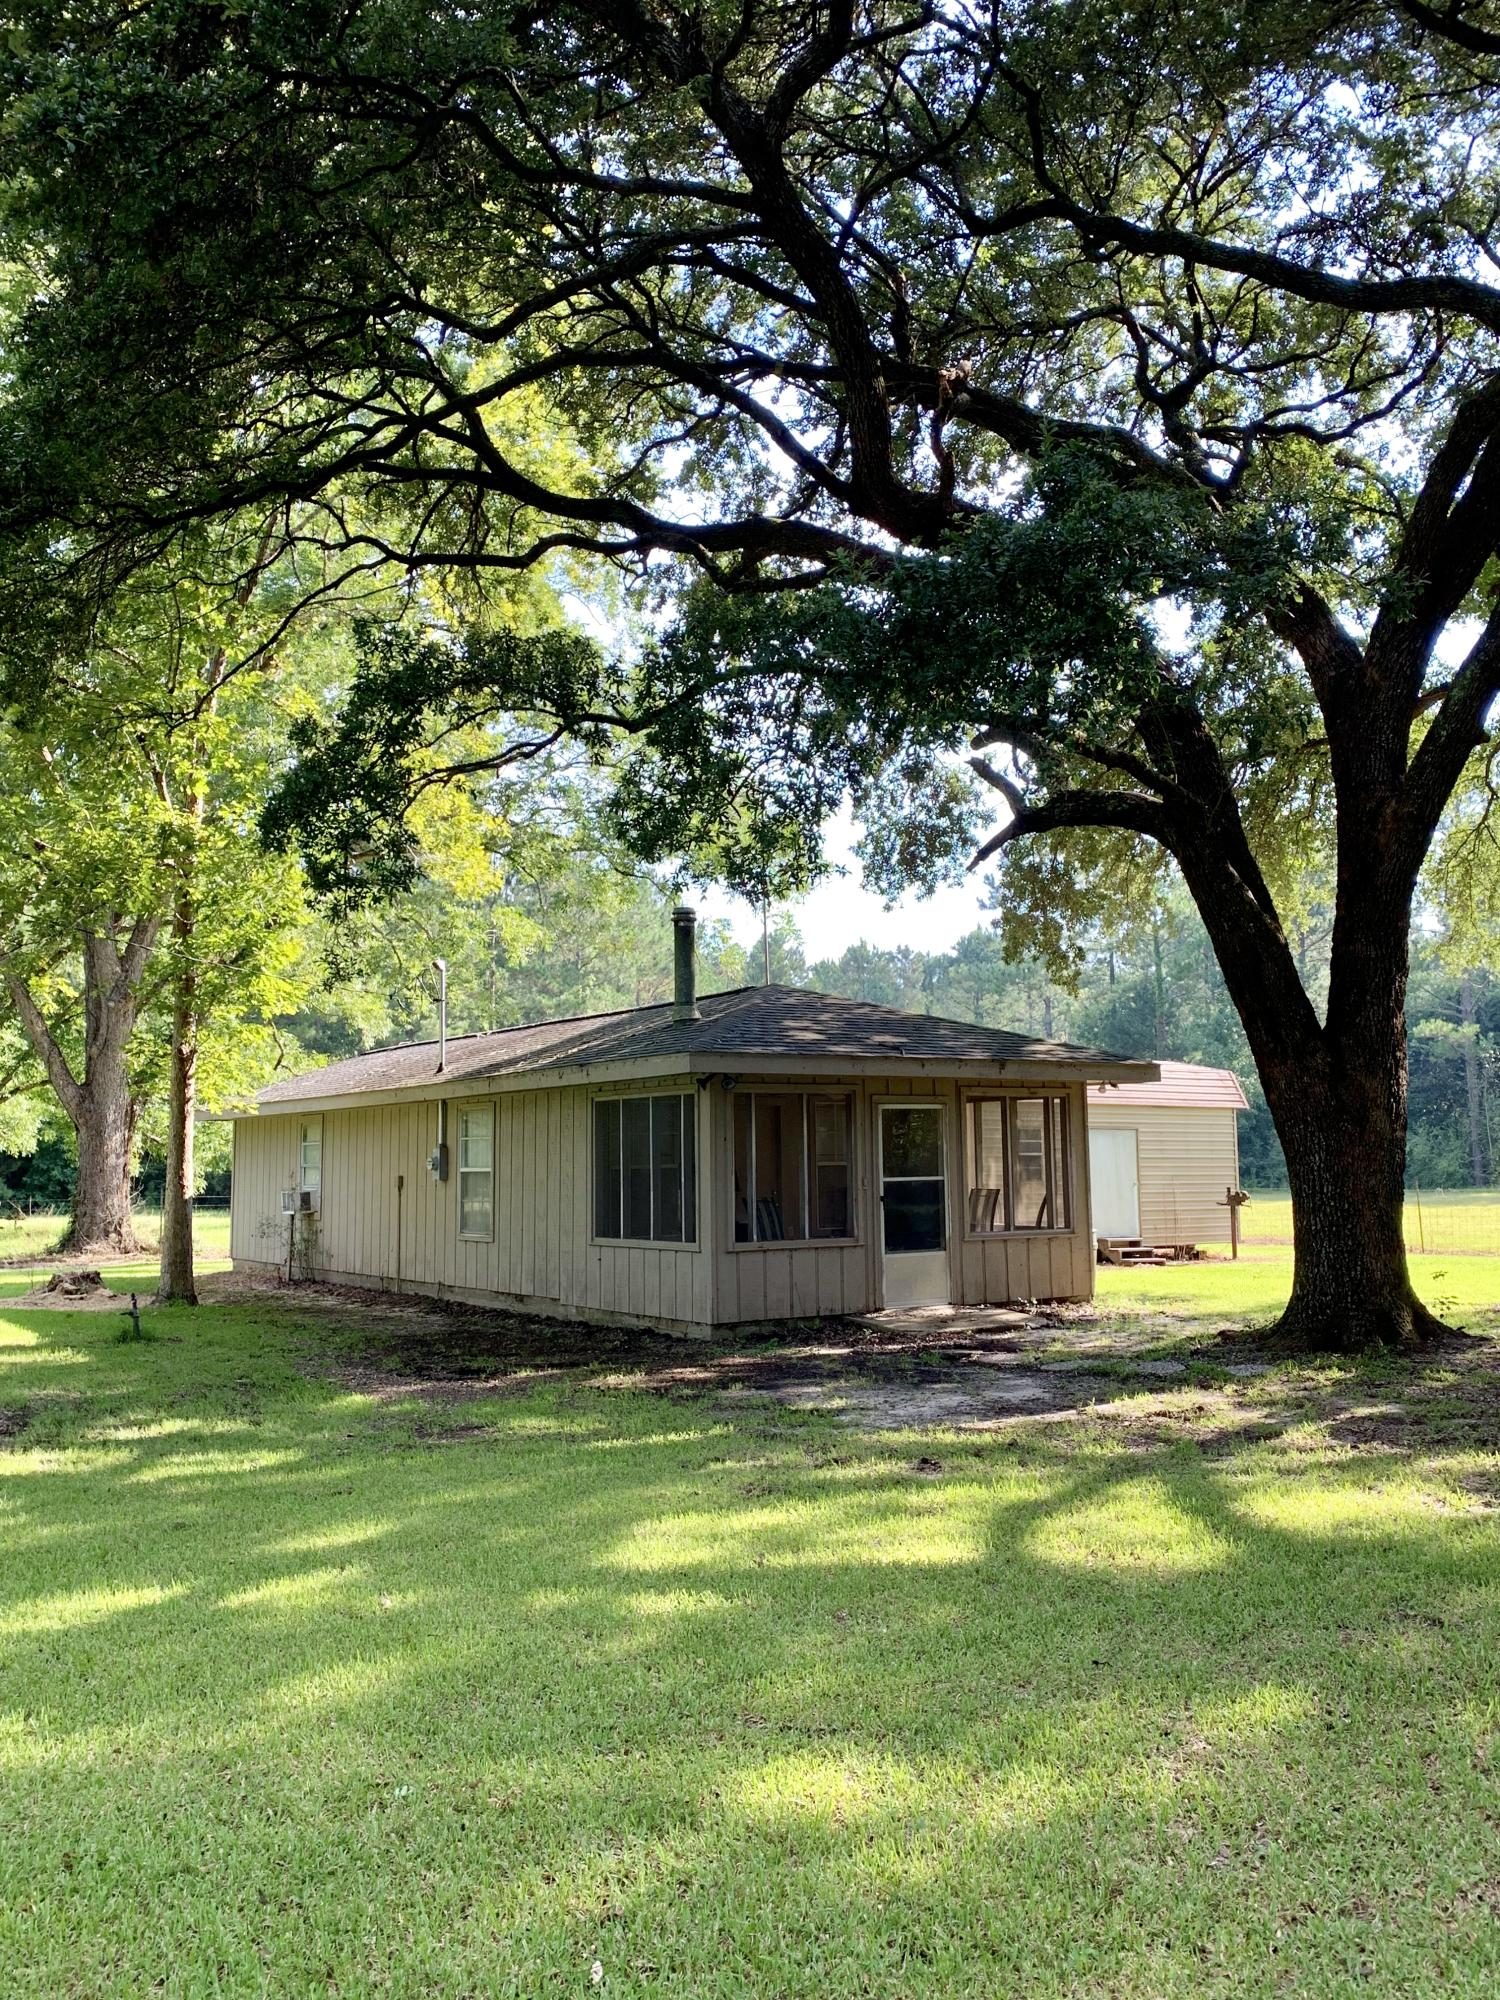 Mittie home for sale, 1033 Gravel Pit Rd, Mittie LA - $398,000